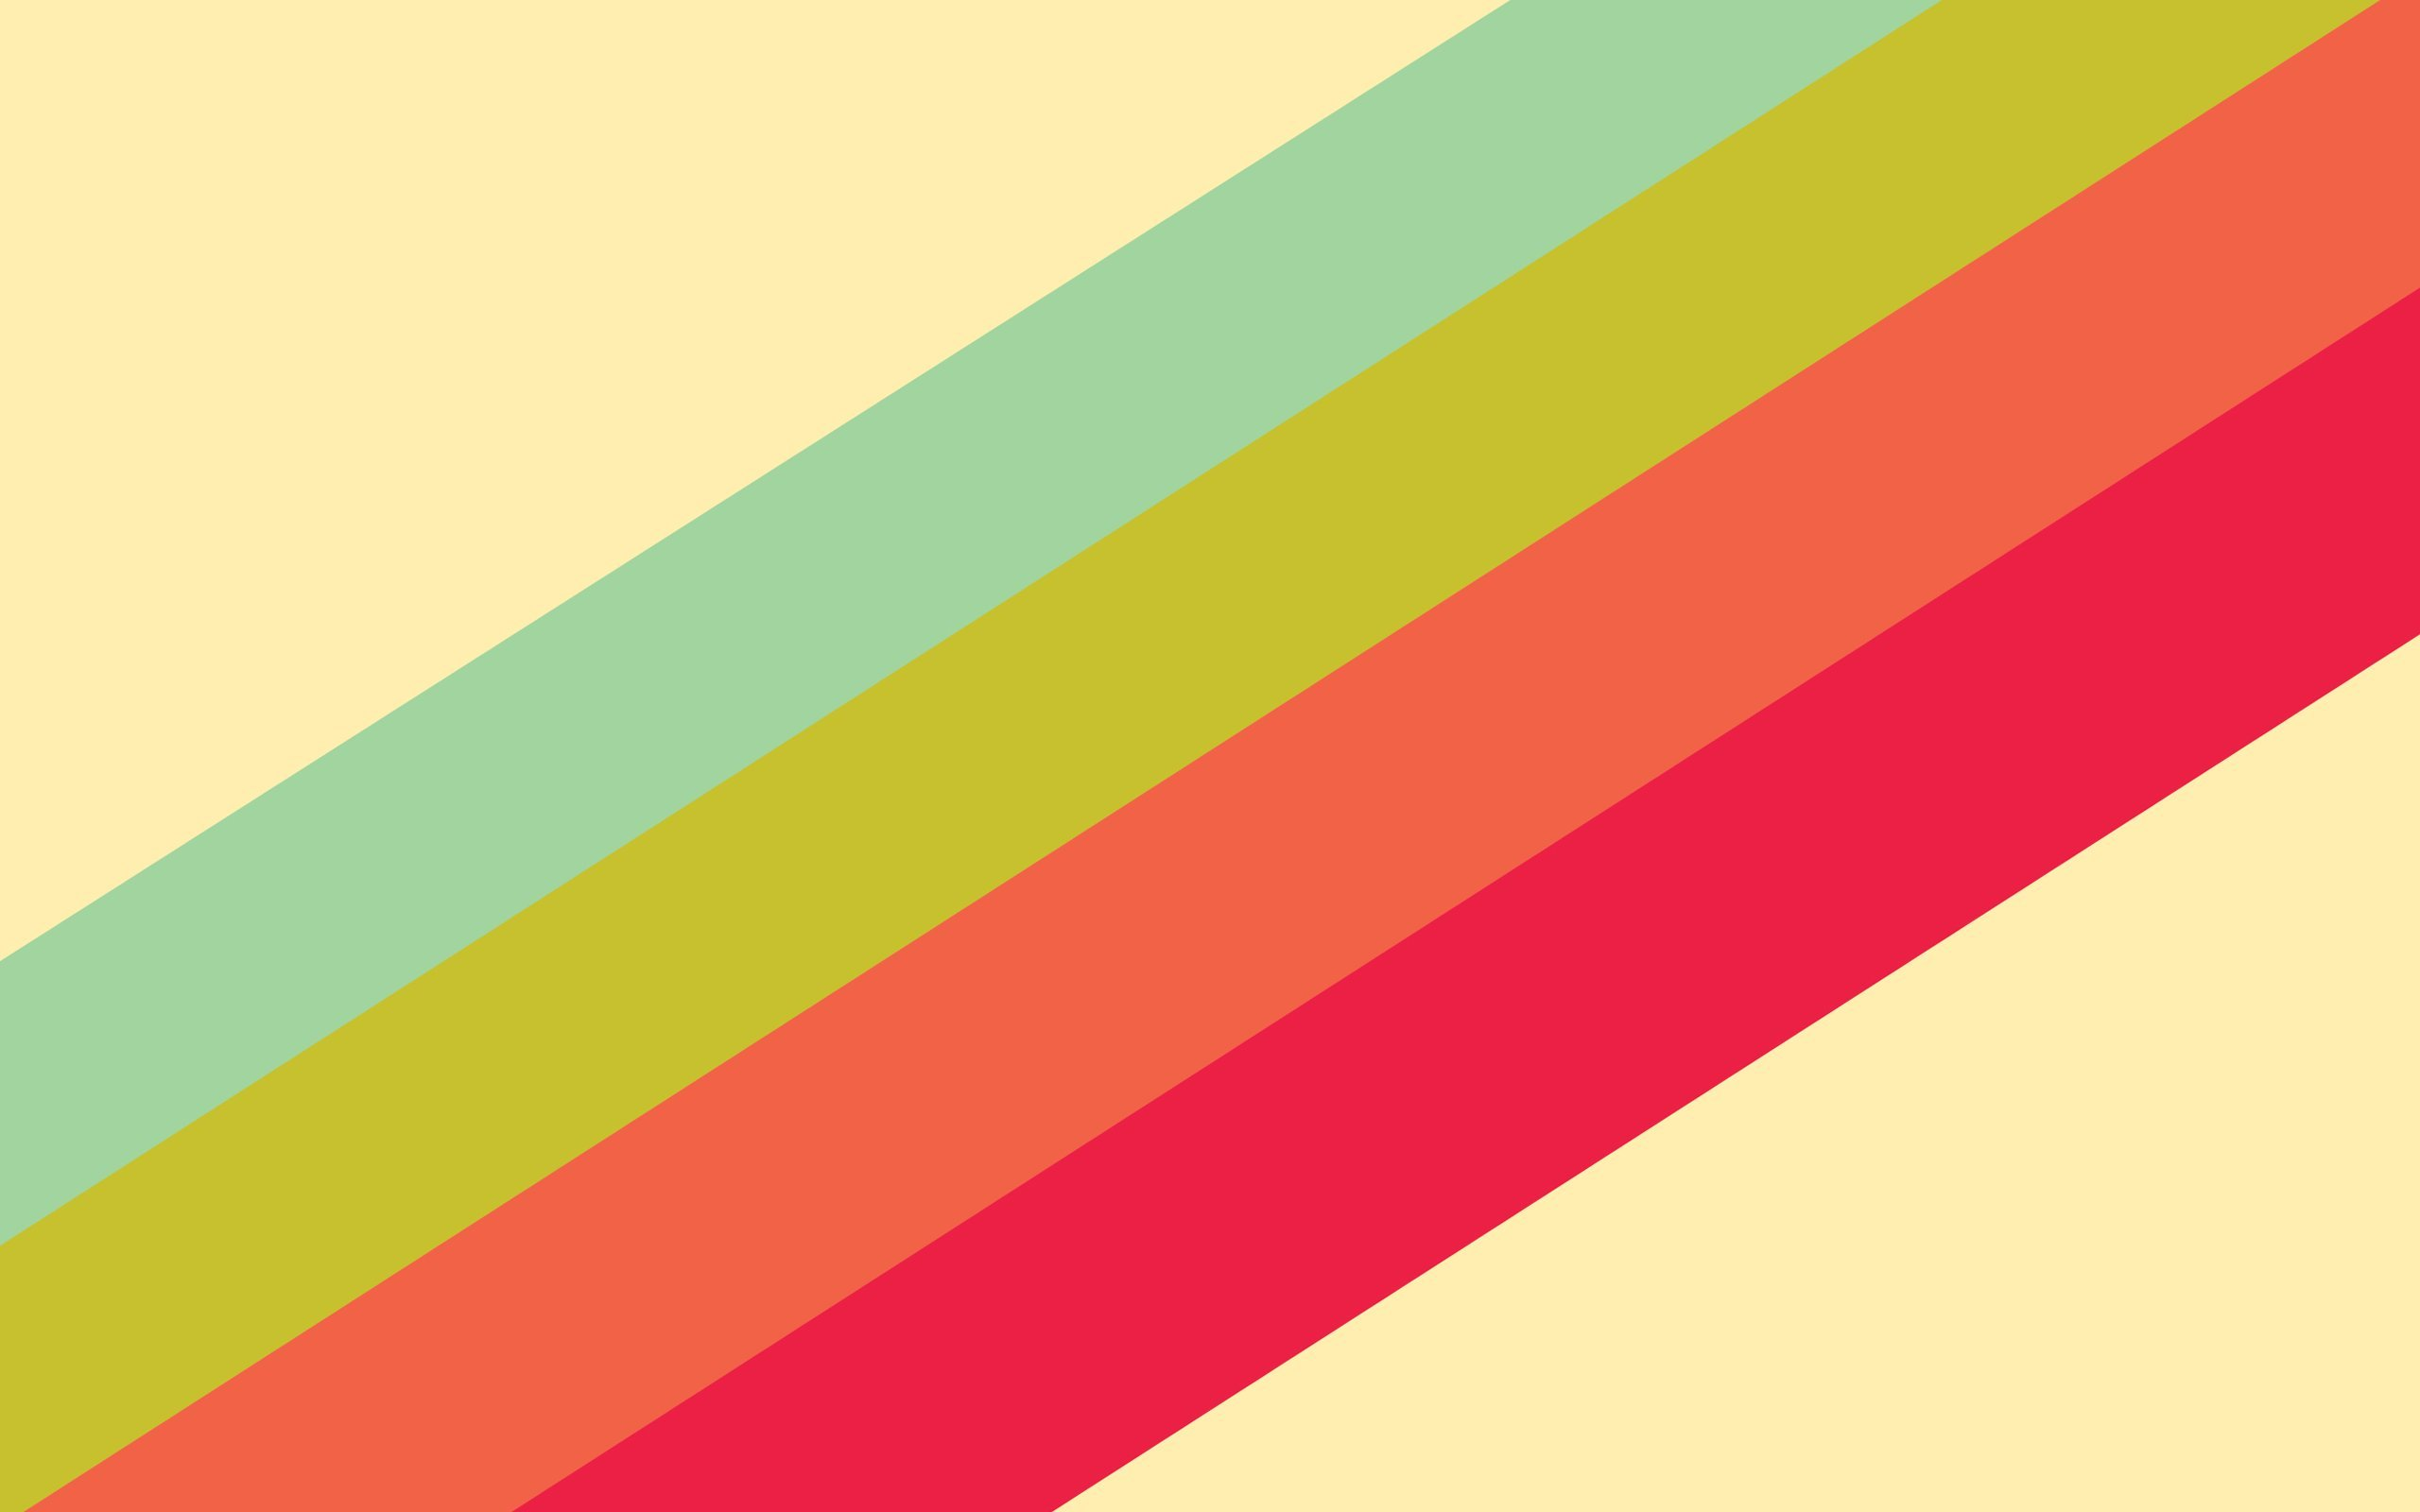 colores fondos de escritorio - photo #23